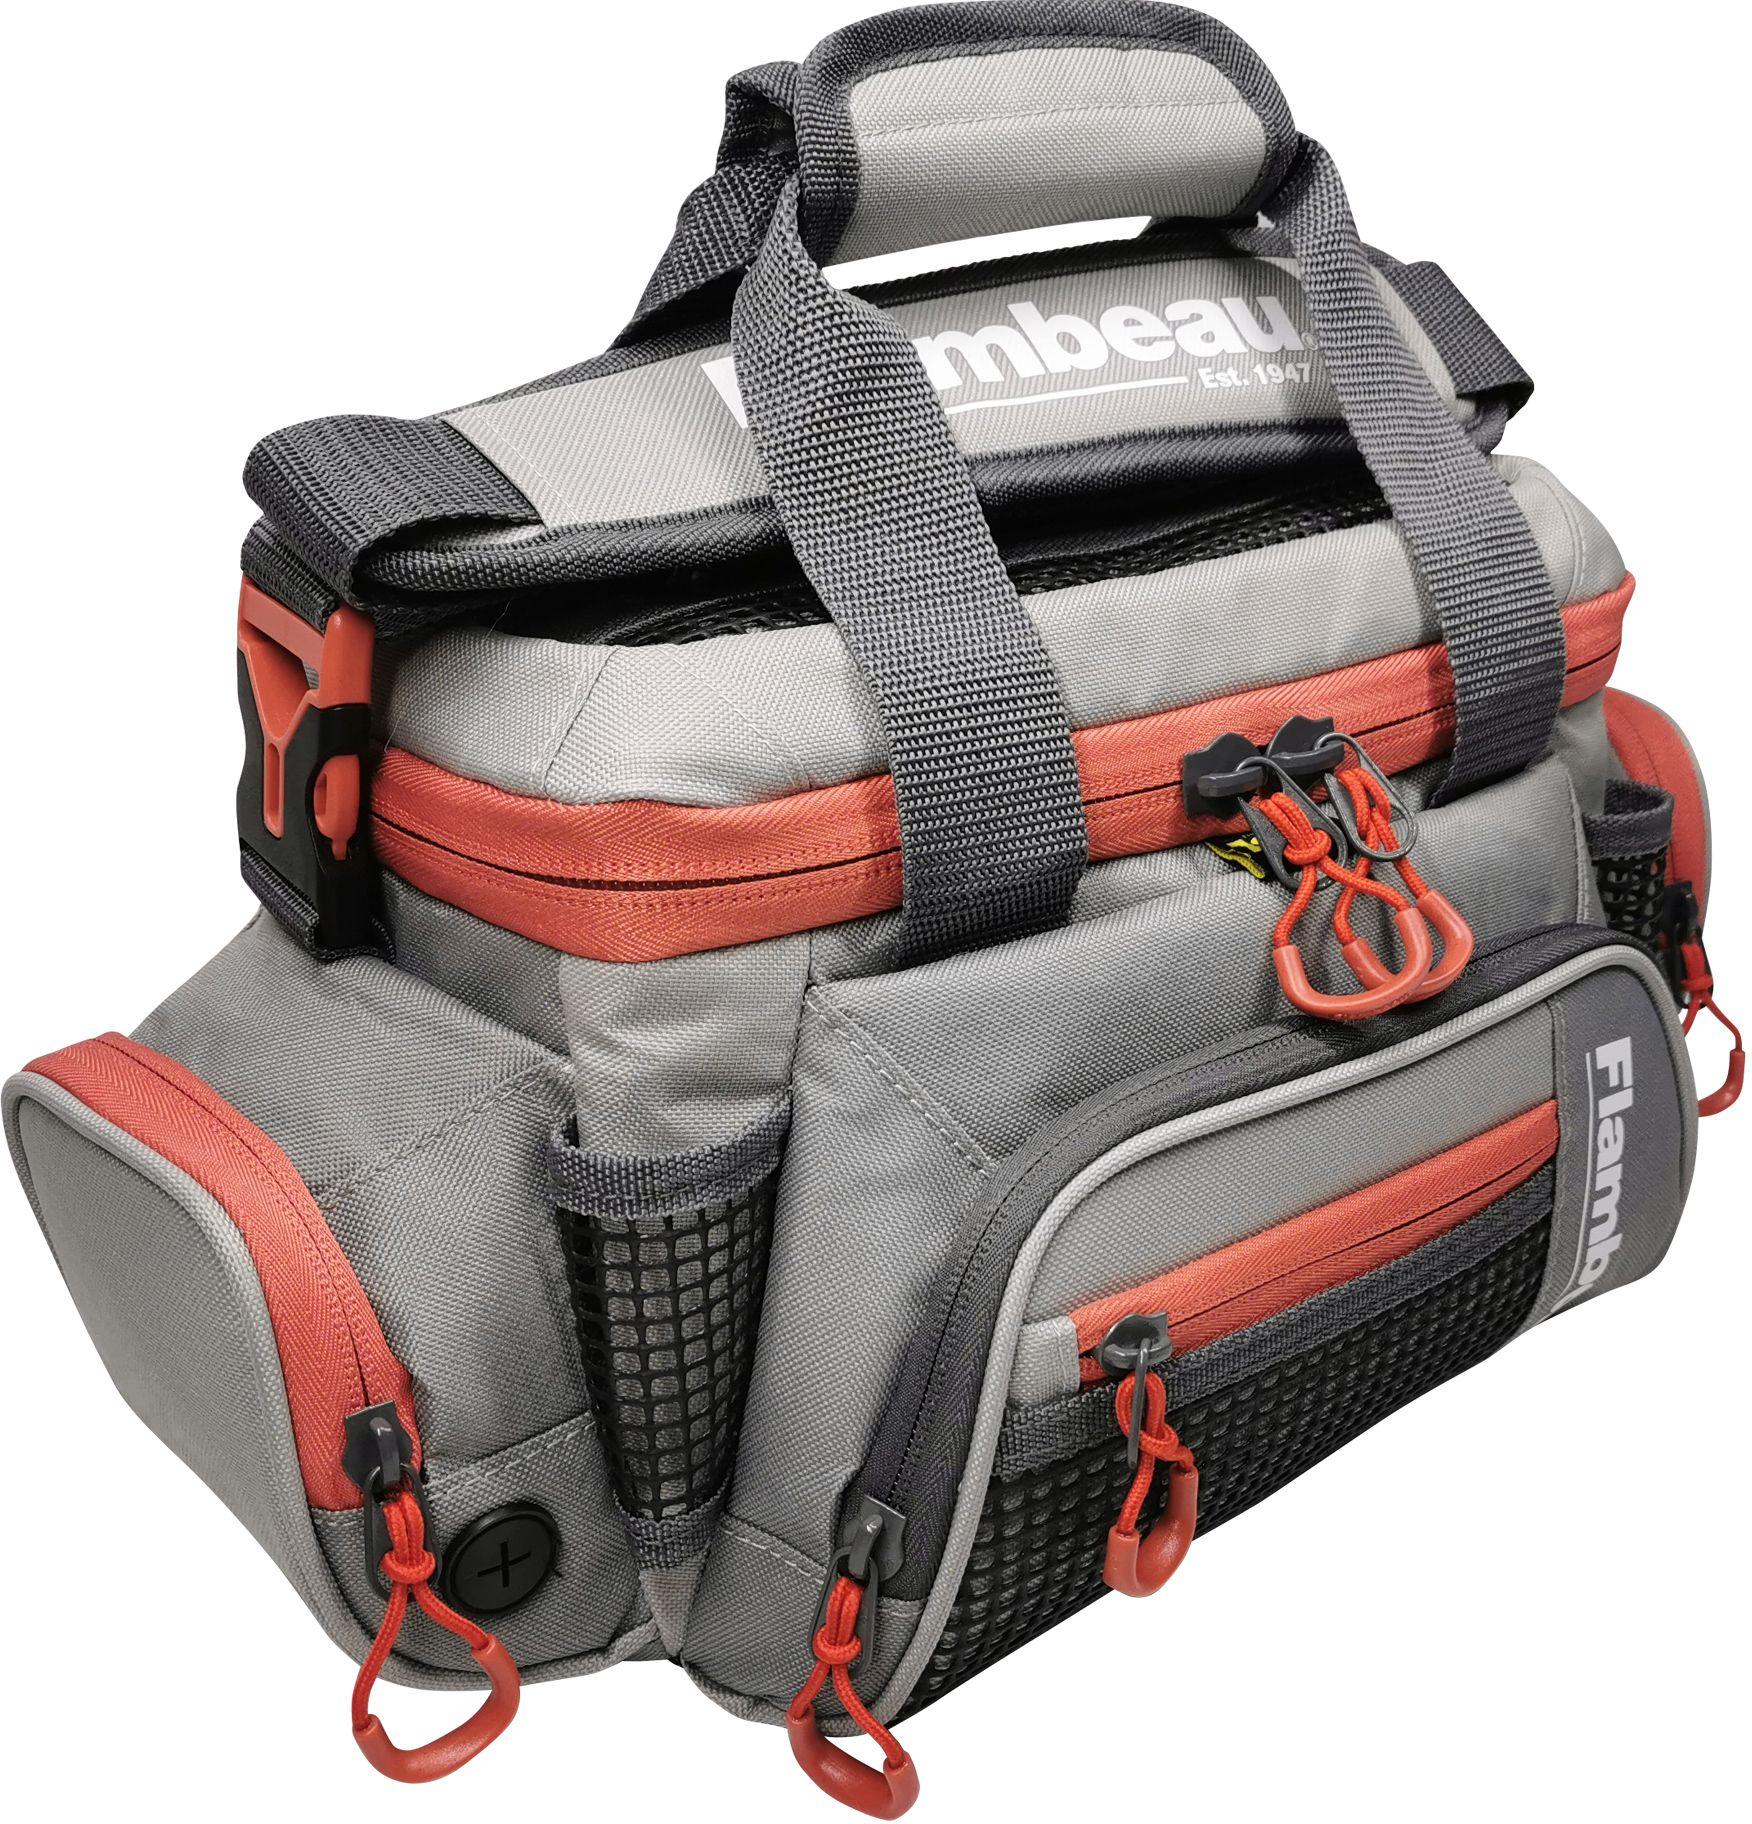 Flambeau Pro-Angler 5007 Tackle Bag, Grey/red